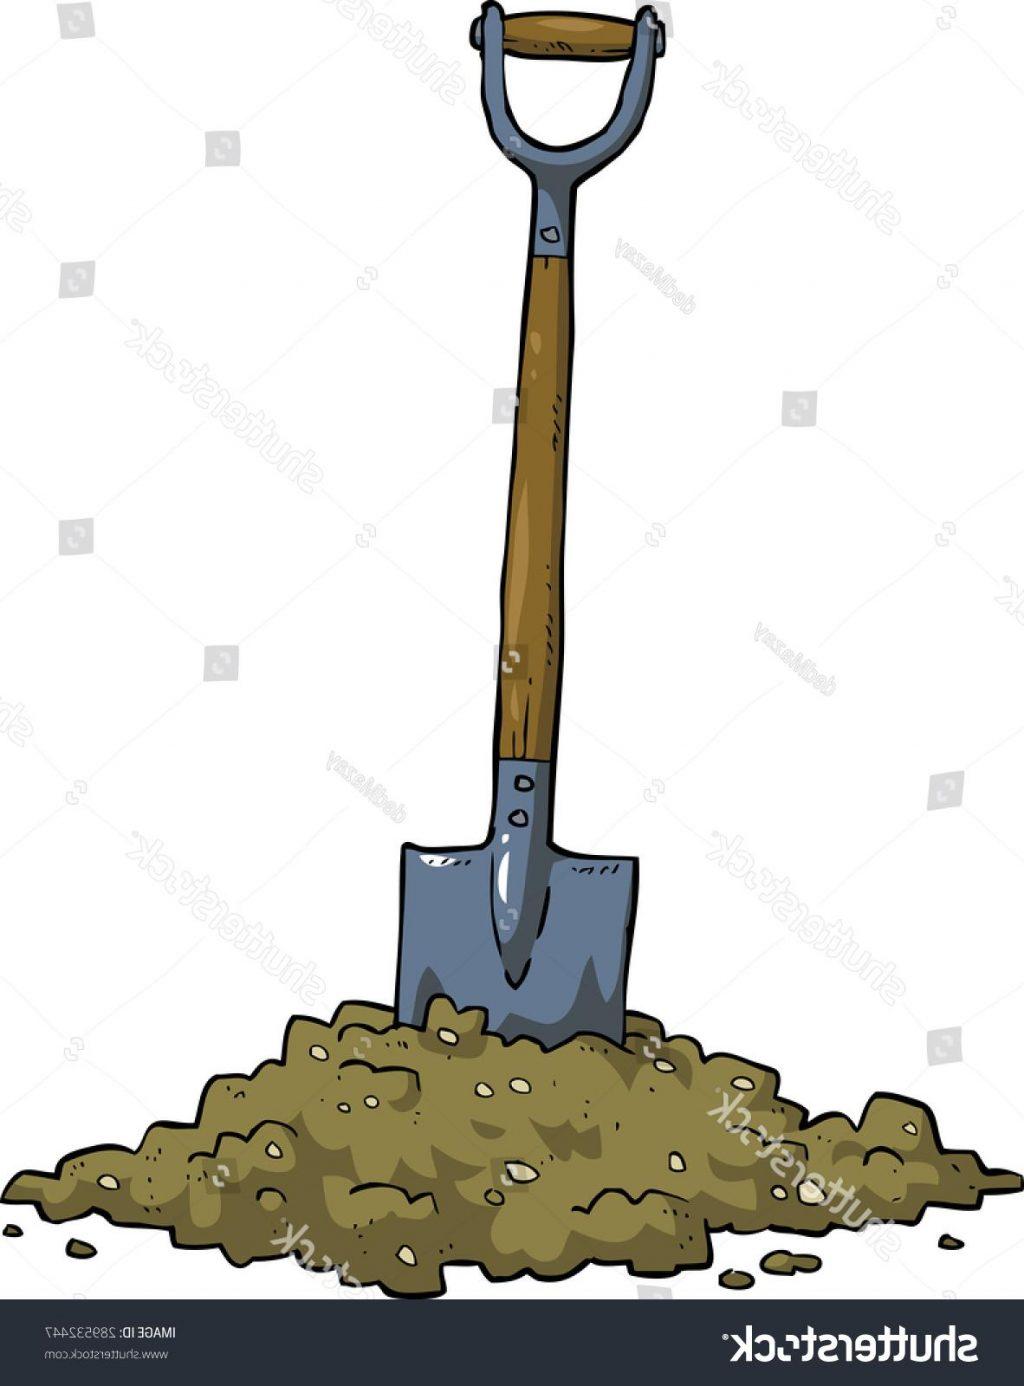 shovel drawing at getdrawings com free for personal use shovel